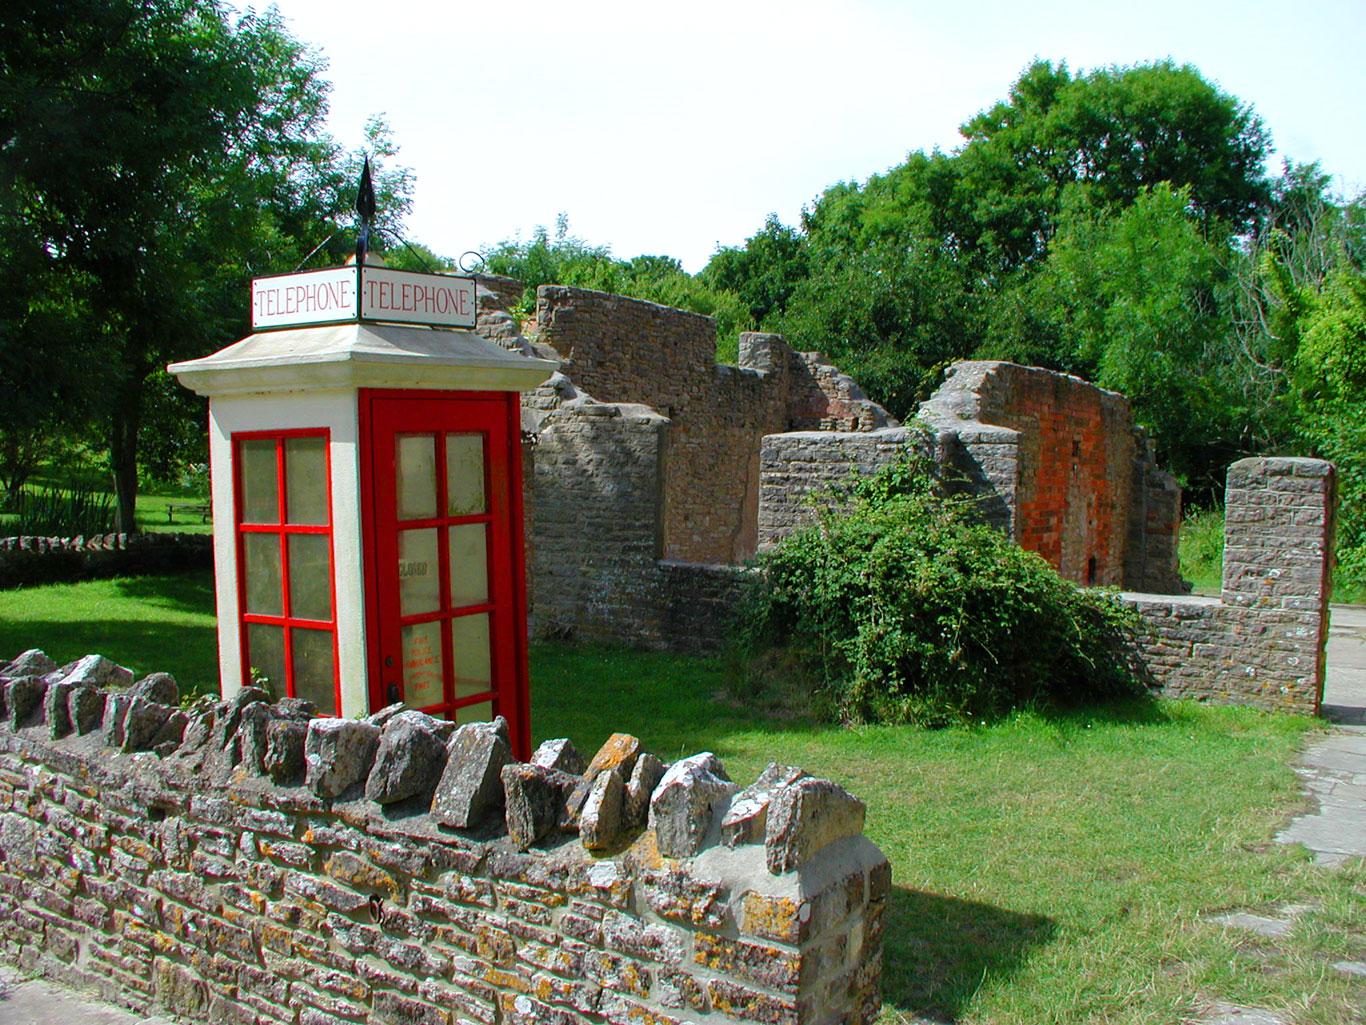 Tyneham Telephone Box